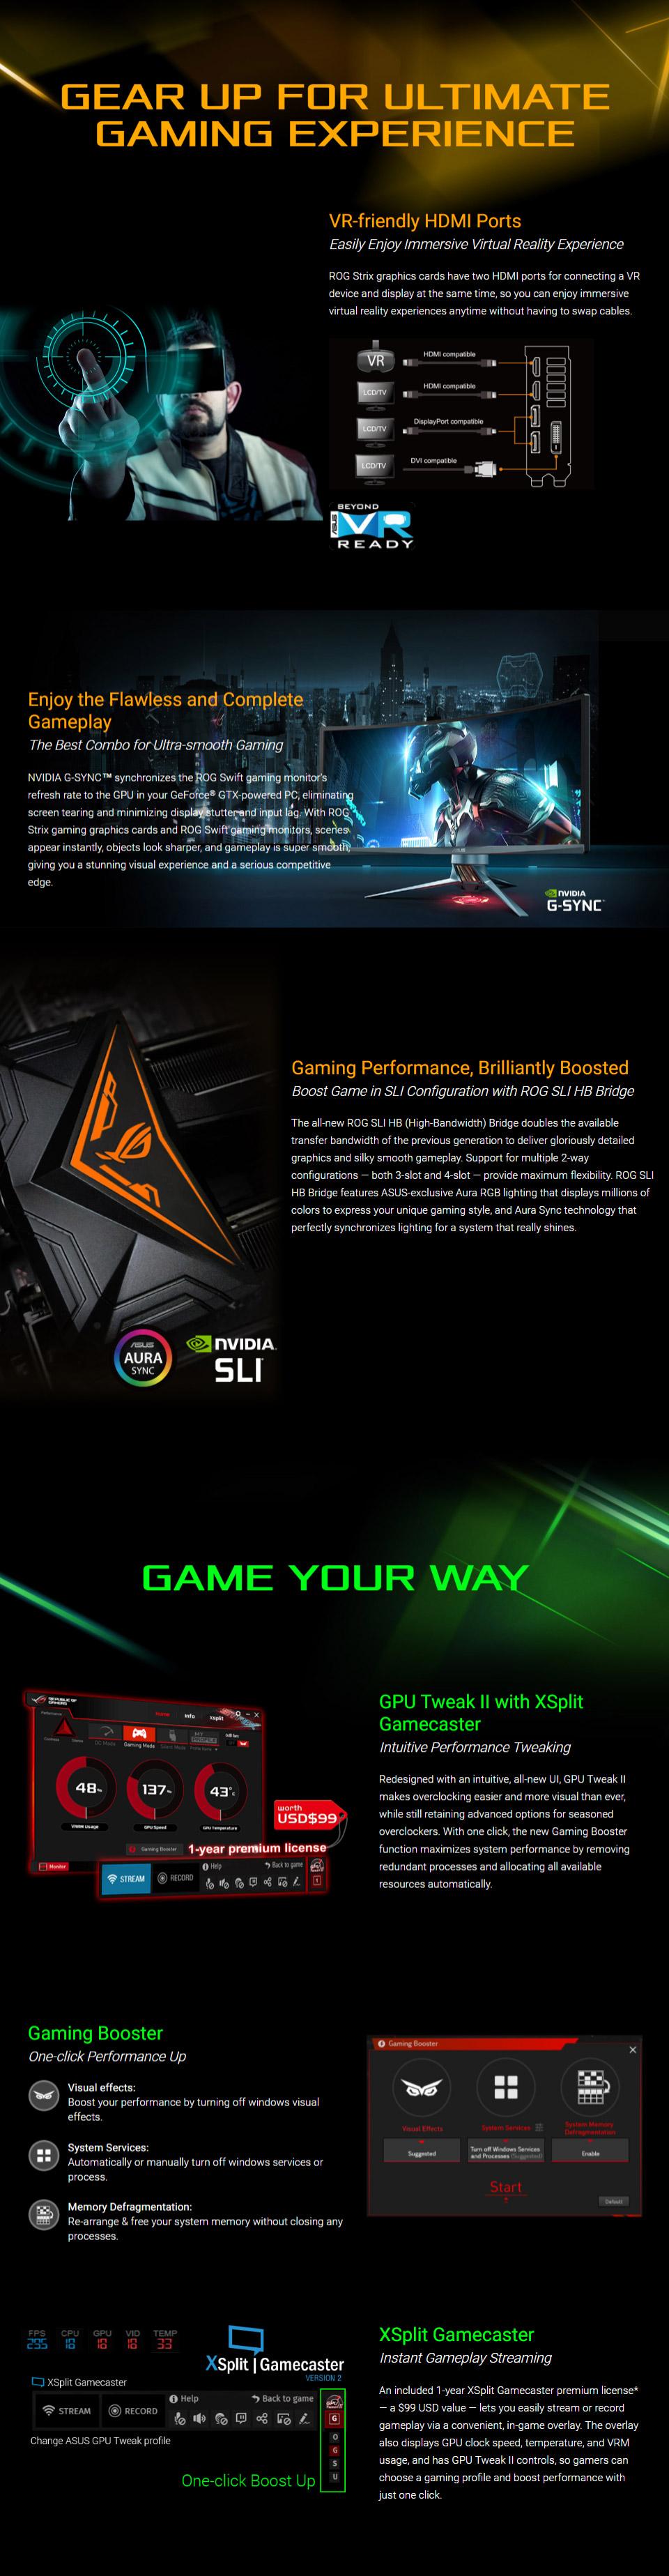 ASUS ROG Strix GeForce GTX 1080 Ti 11GB [ROG-STRIX-GTX1080TI